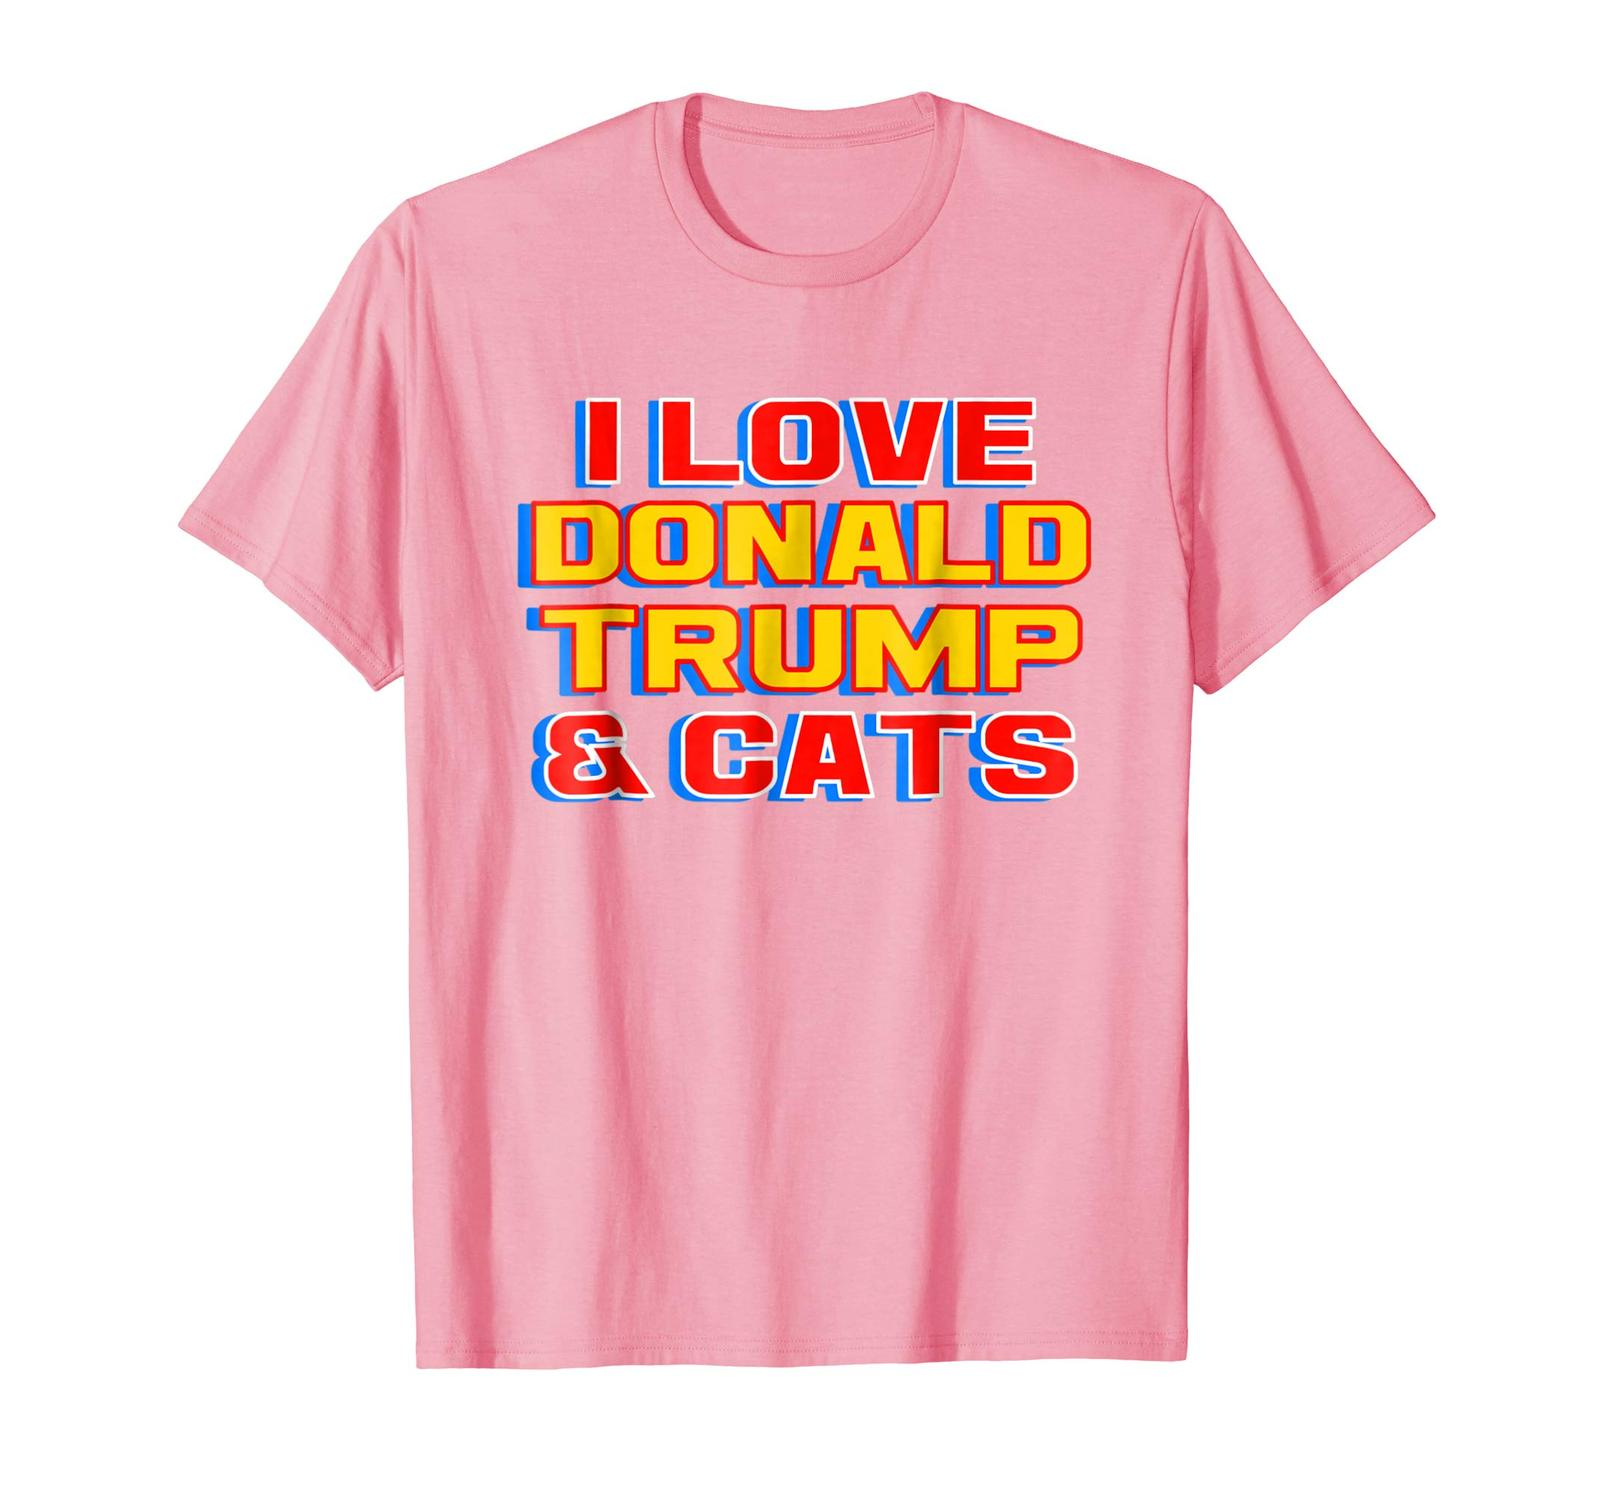 New Shirts - I Love Donald Trump & News Funny New Gift T-Shirt Men Women Men